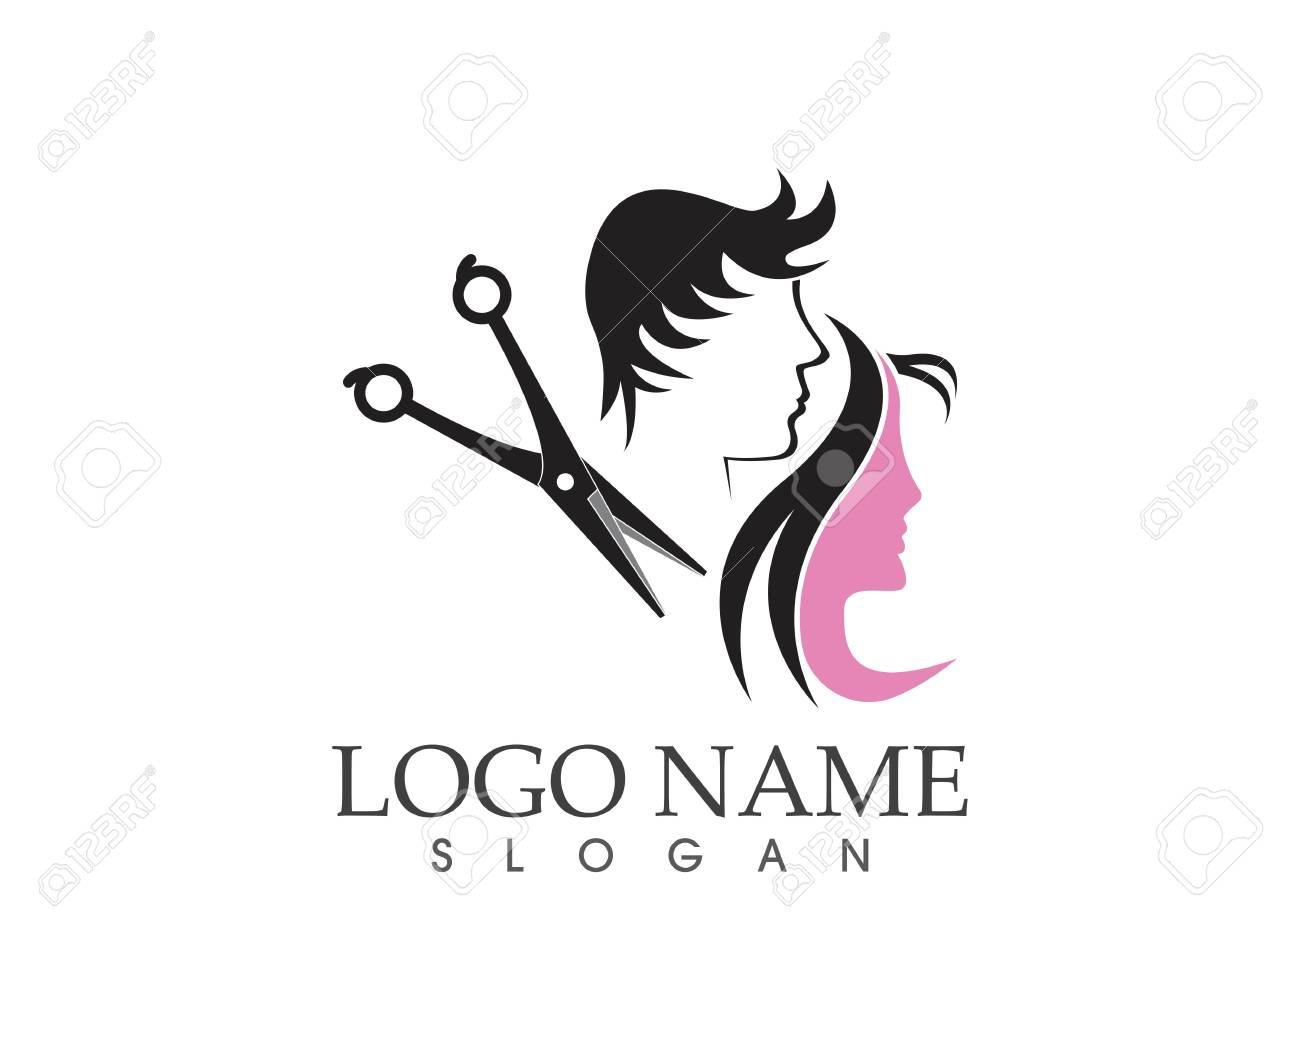 Haircut style logo design vector illustration